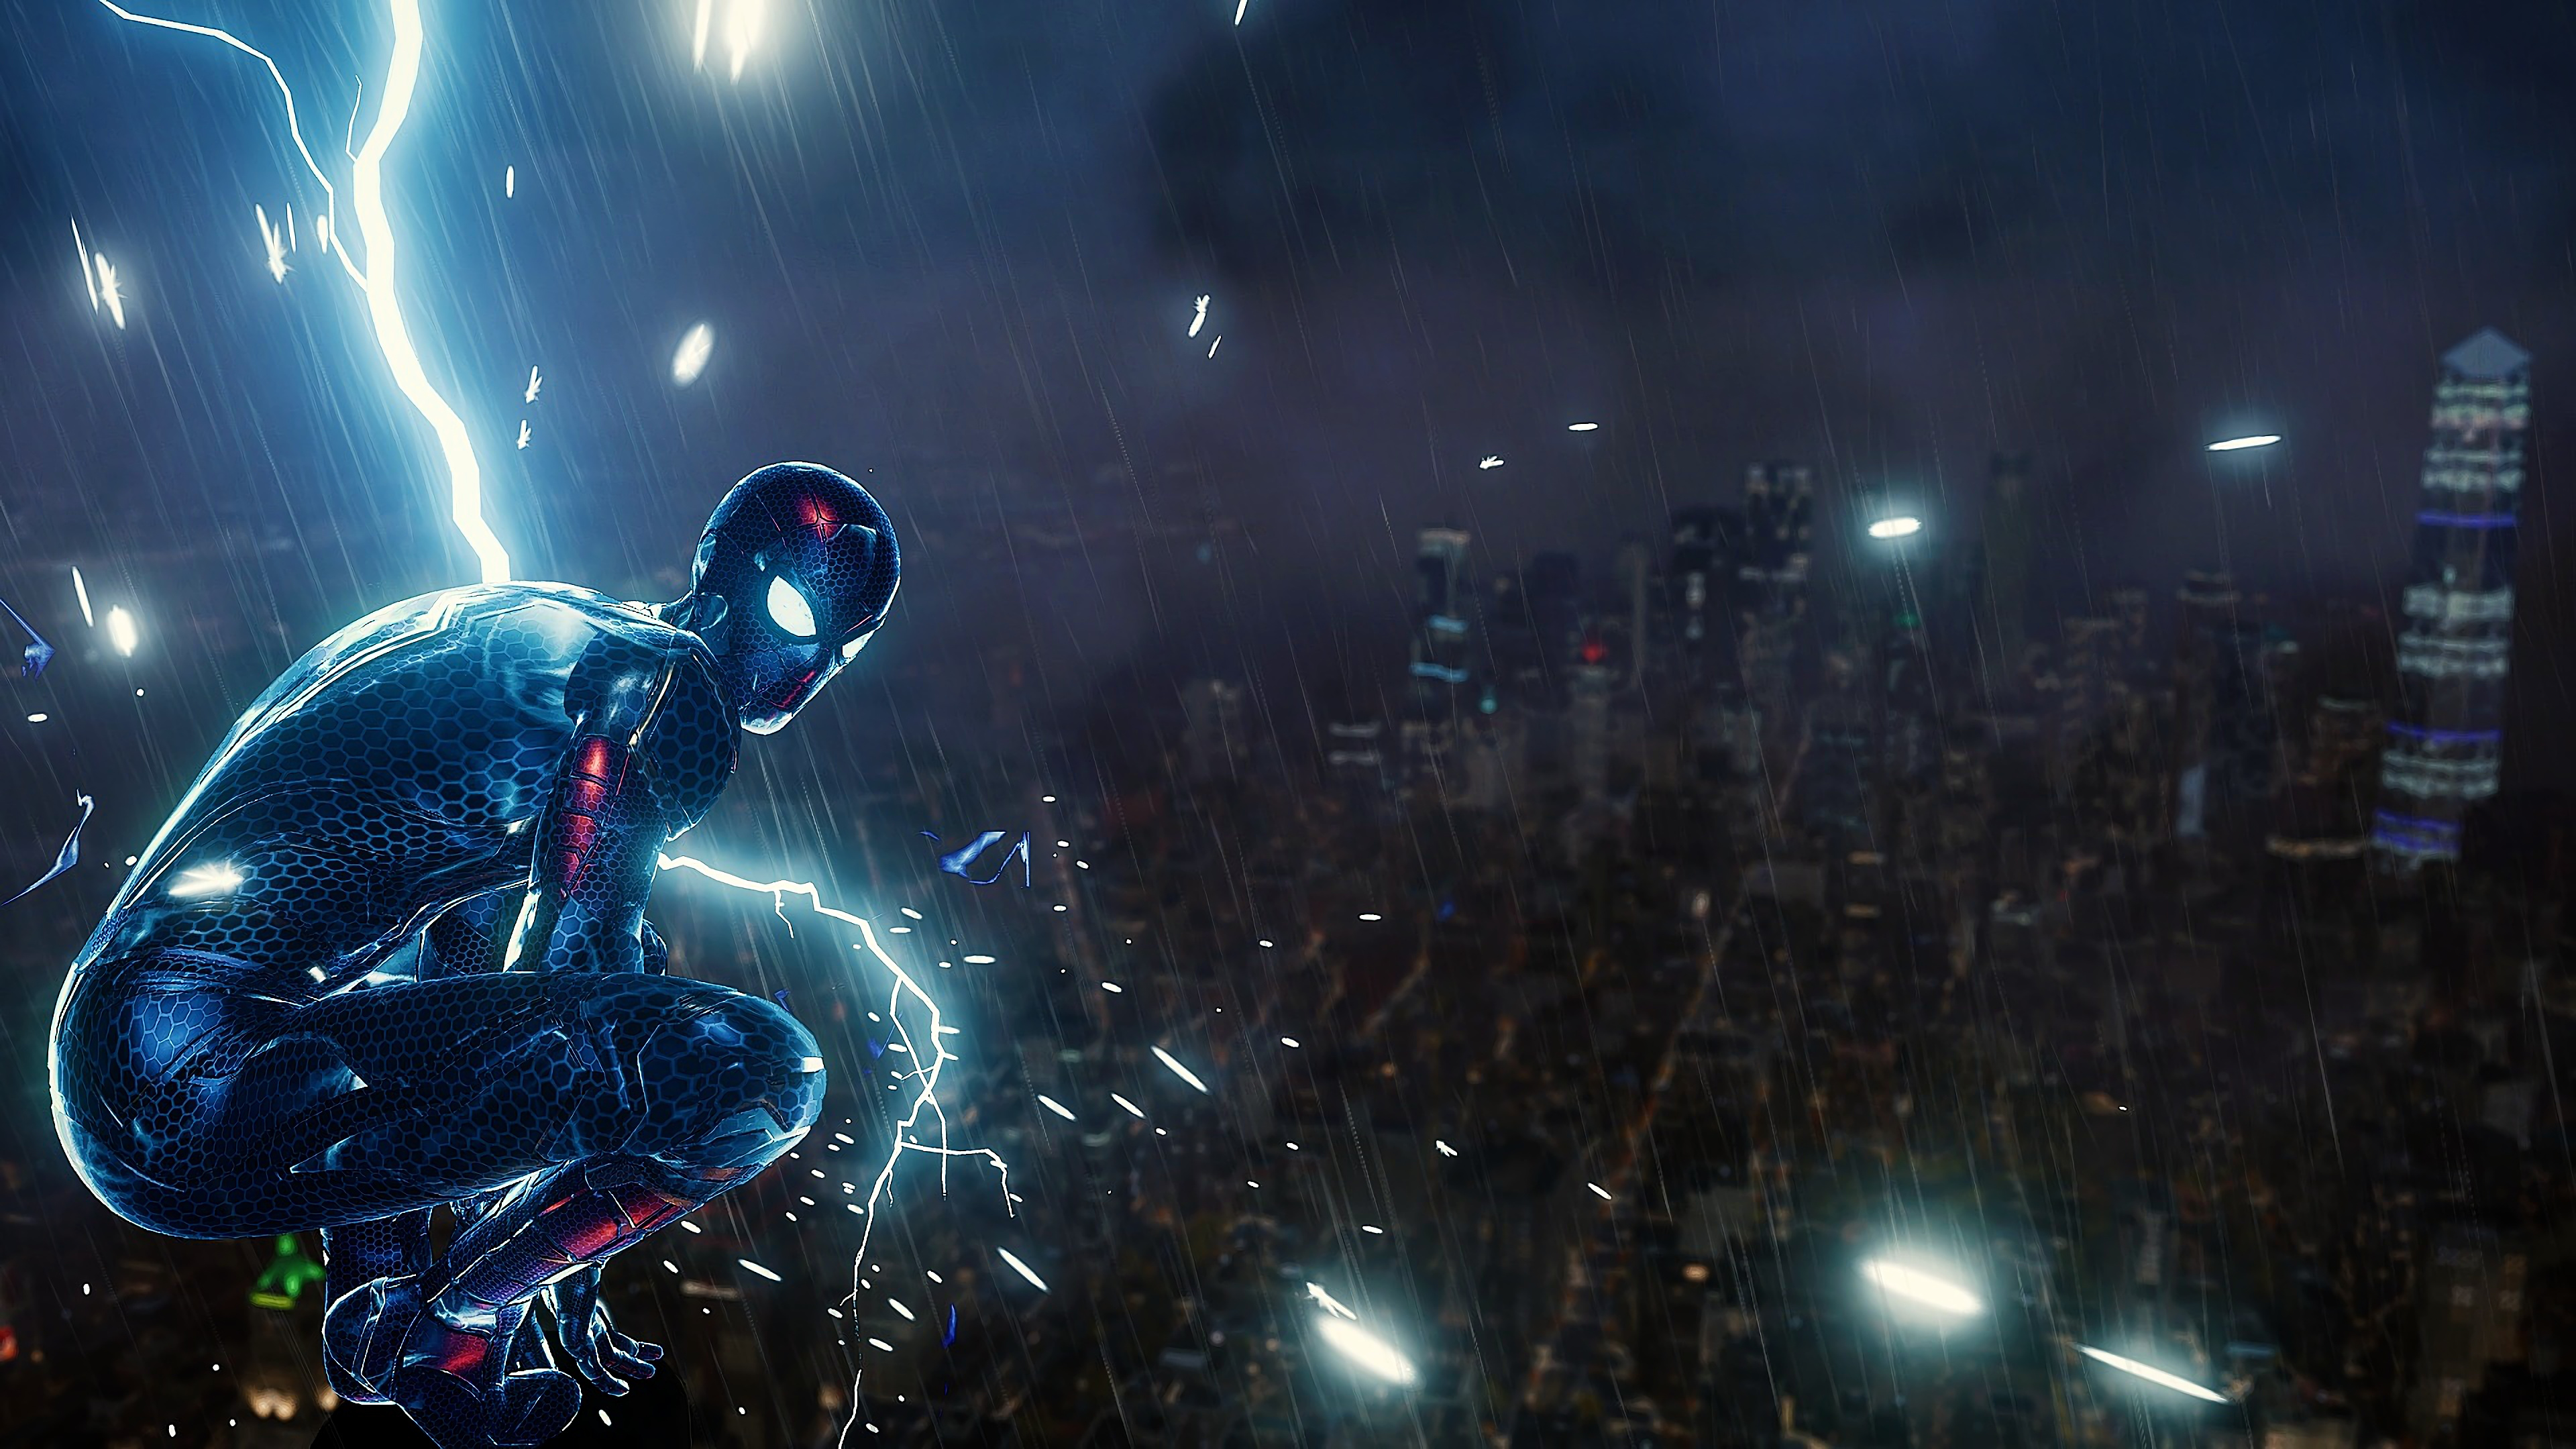 Spiderman ps4 lighting hd superheroes 4k wallpapers - Ps4 wallpaper hd ...